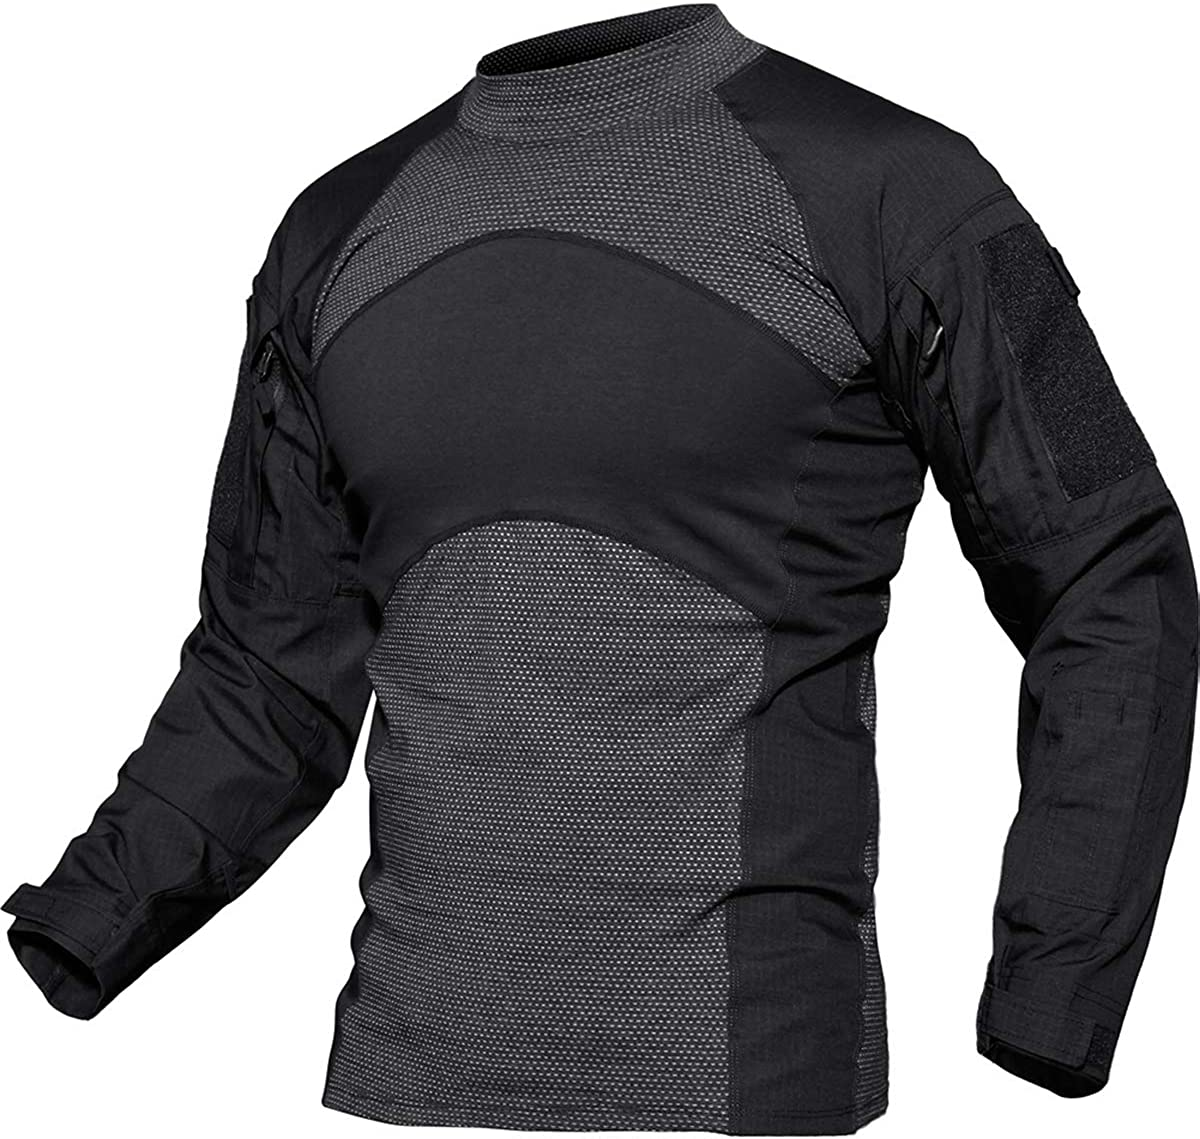 TACVASEN Men's Slim Fit Military Rapid Assault Tactical Shirt Very Japan Maker New popular Mi